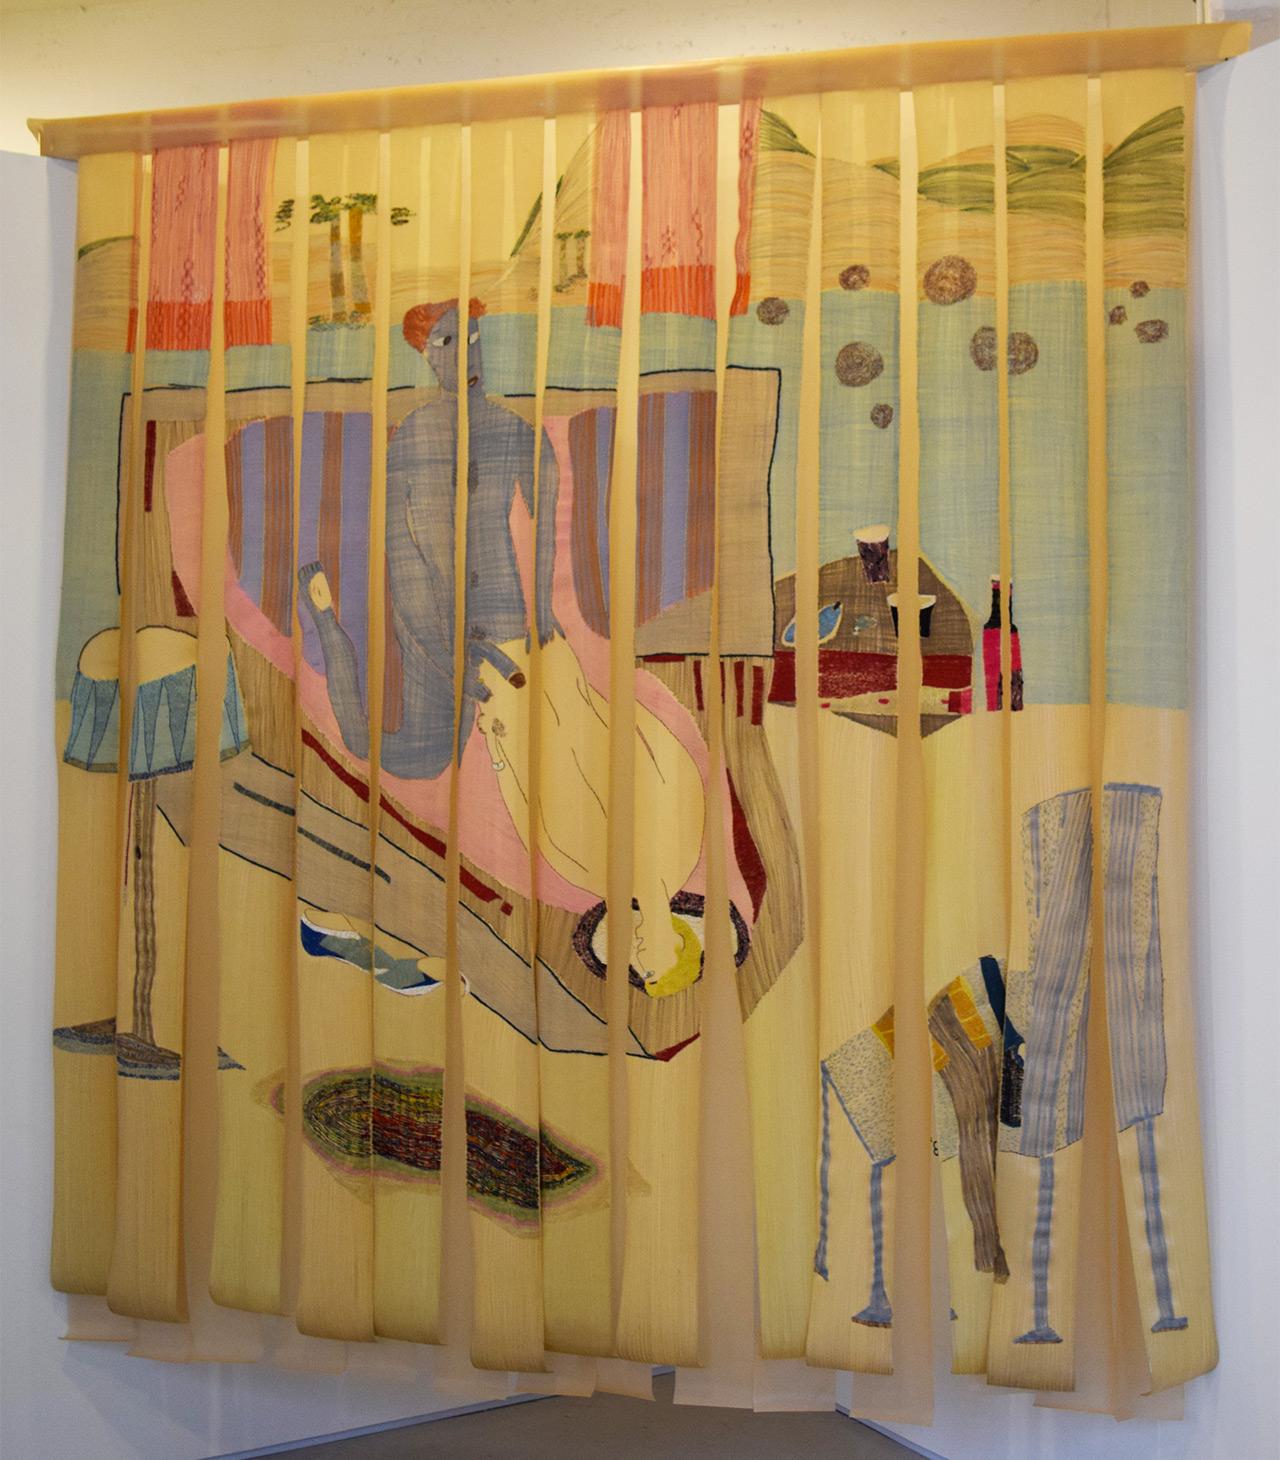 "f. marquespenteado, ""Fodendo com estillo"" (2006) in the Mendes Wood DM booth"